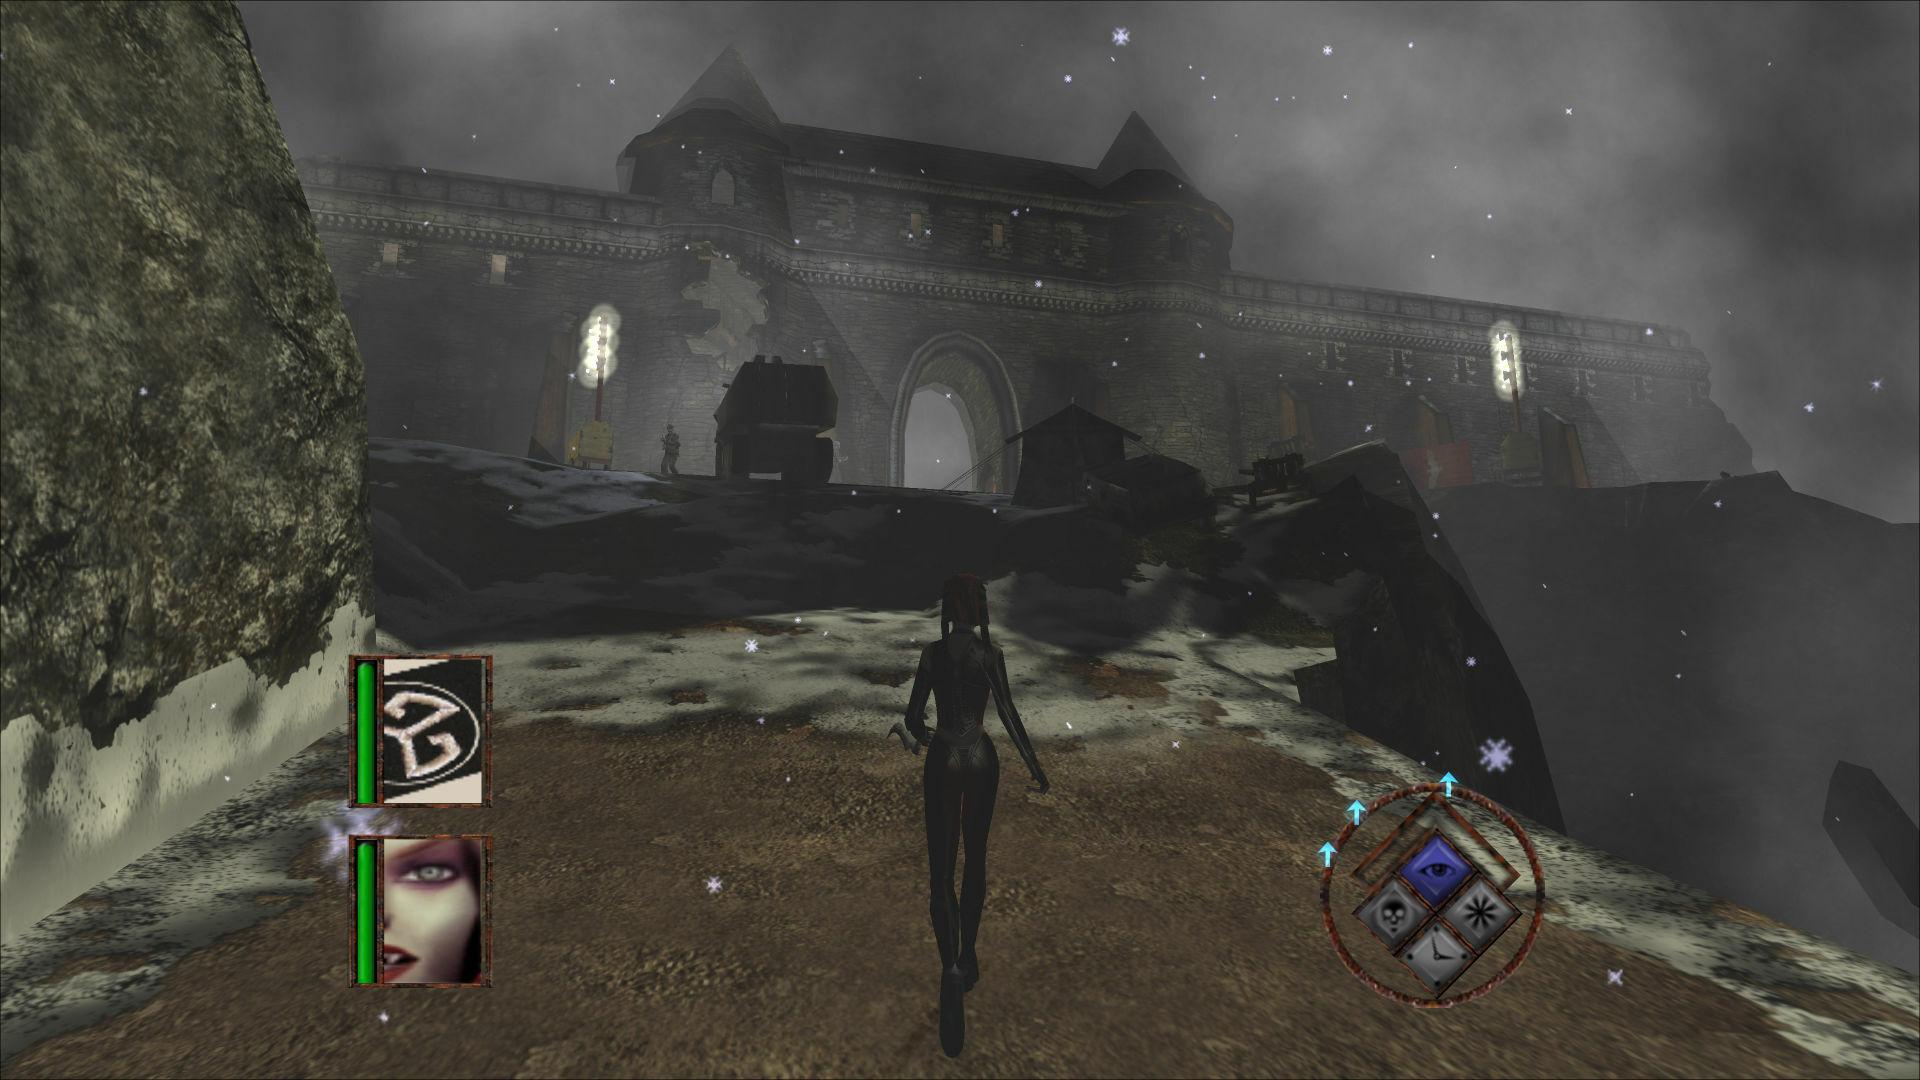 bloodrayne-terminal-cut-pc-screenshot-01